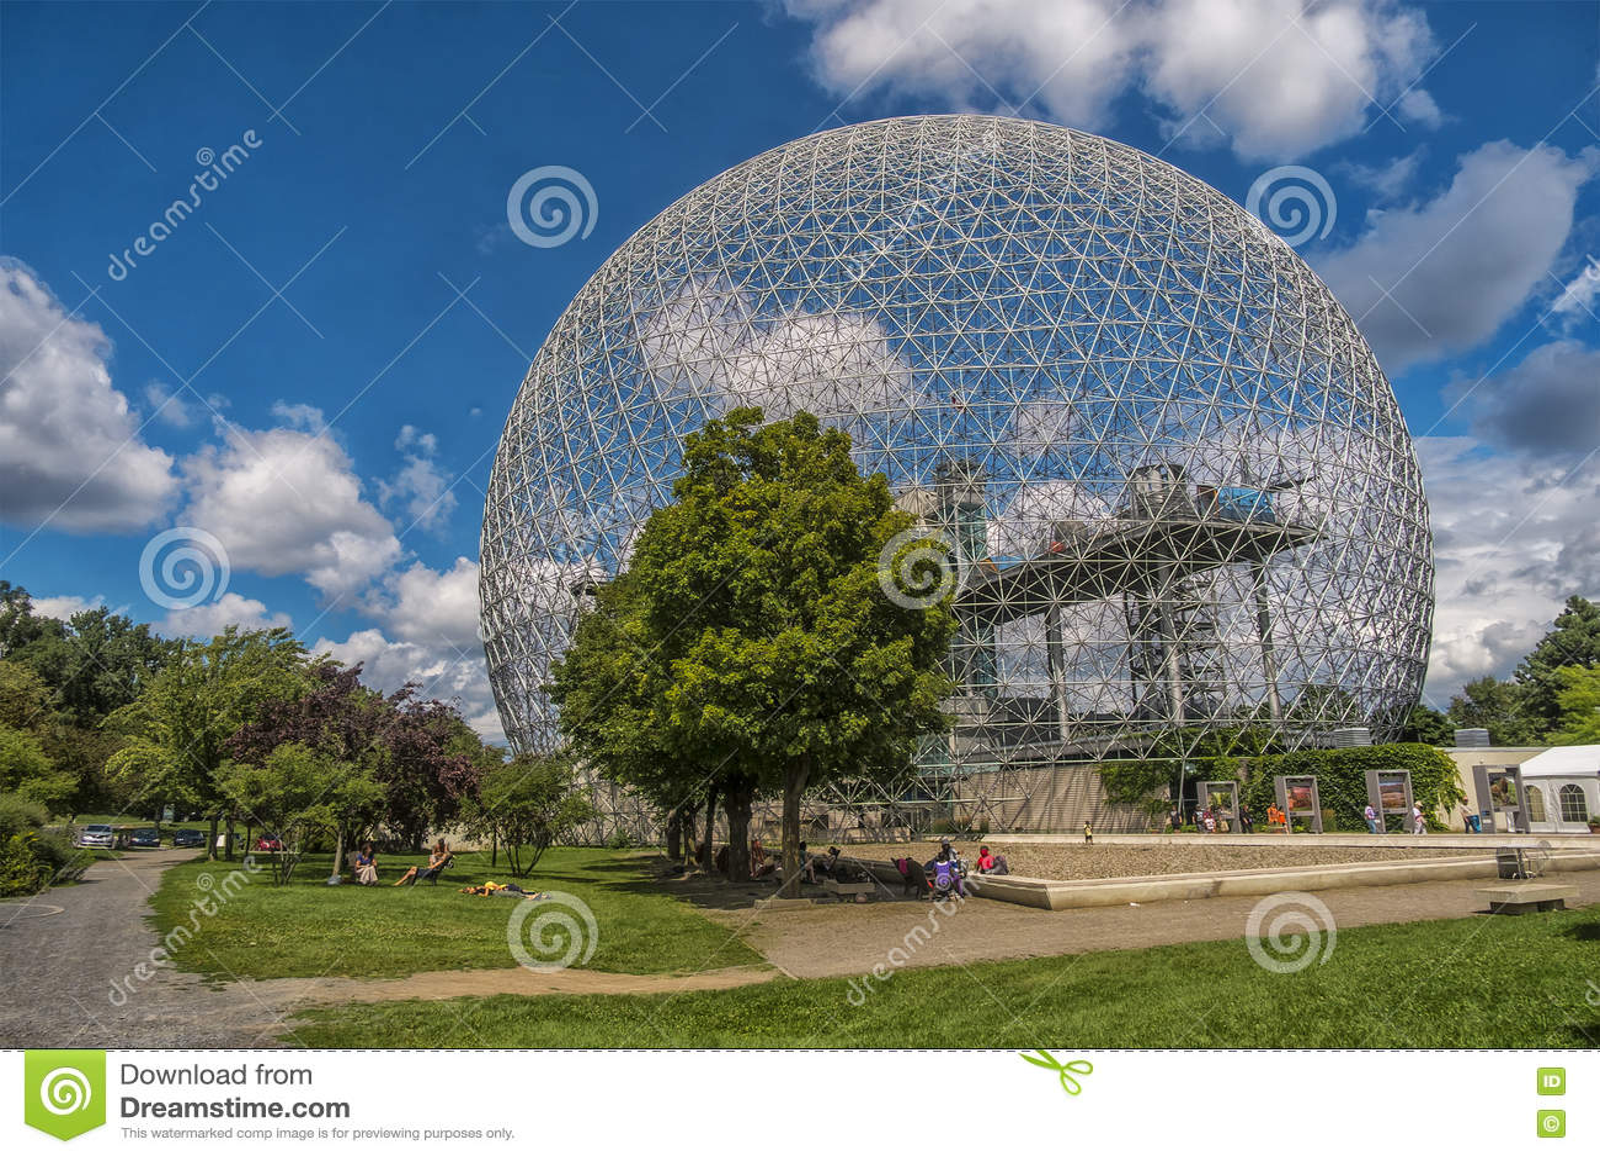 Biosphere, Environment Museum